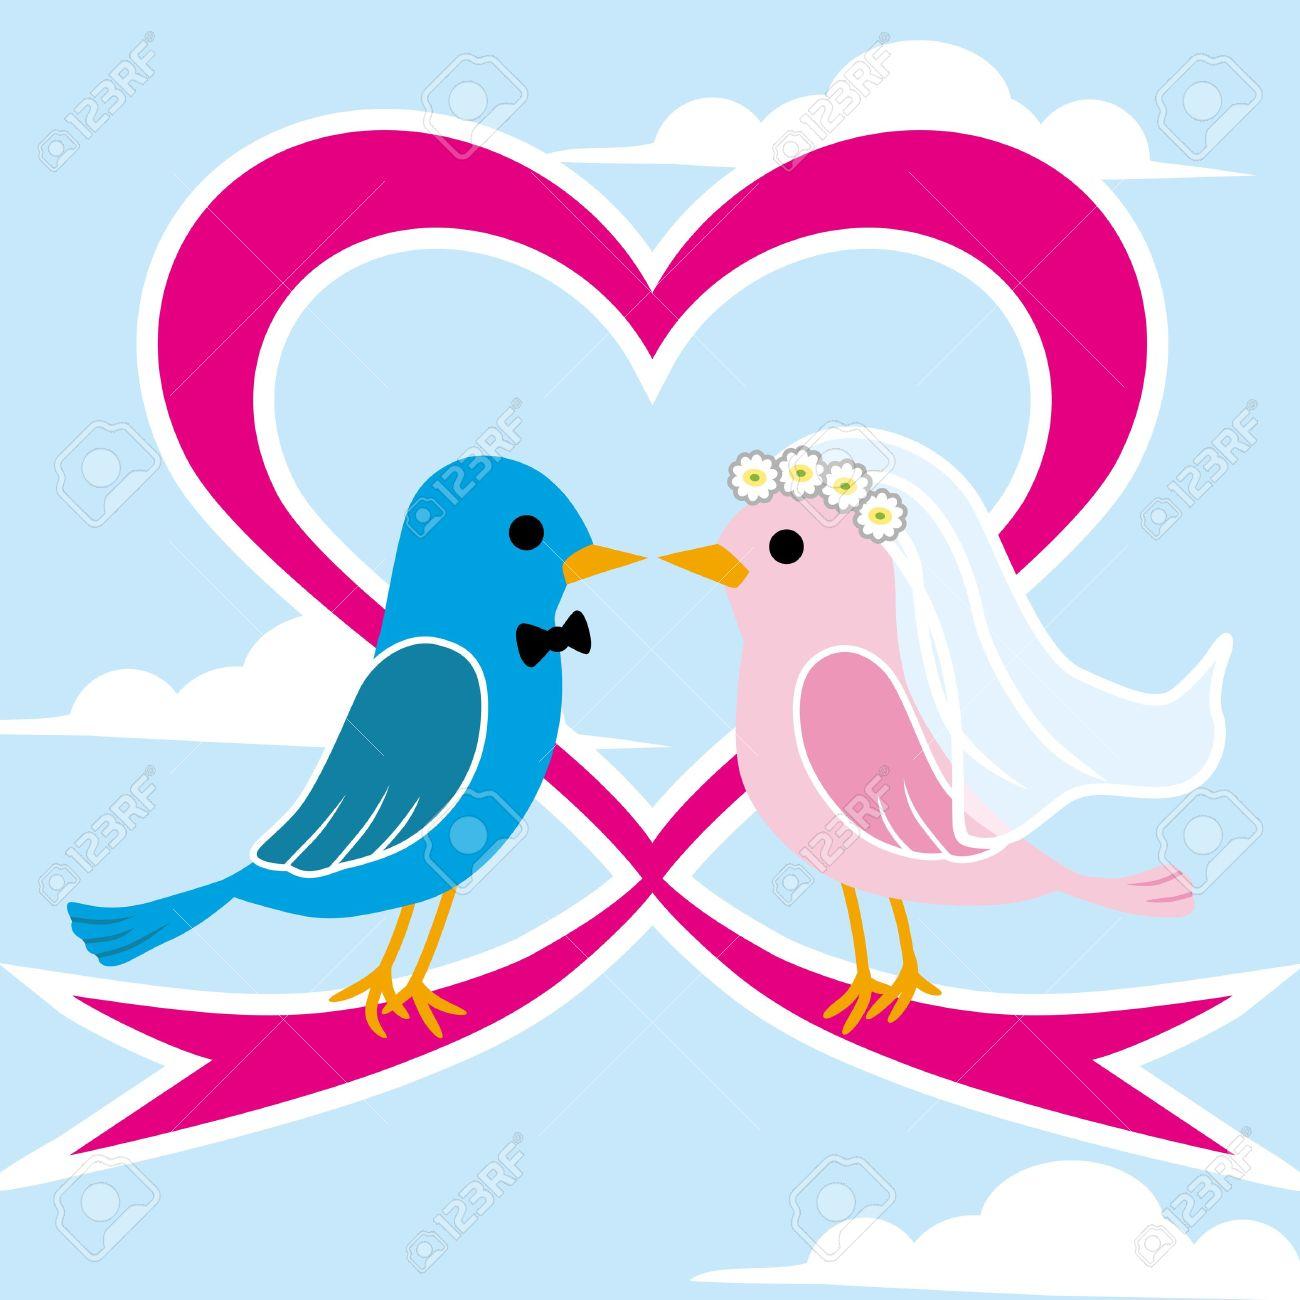 Wedding love bird clipart svg Love Birds Clipart Wedding | Free download best Love Birds ... svg